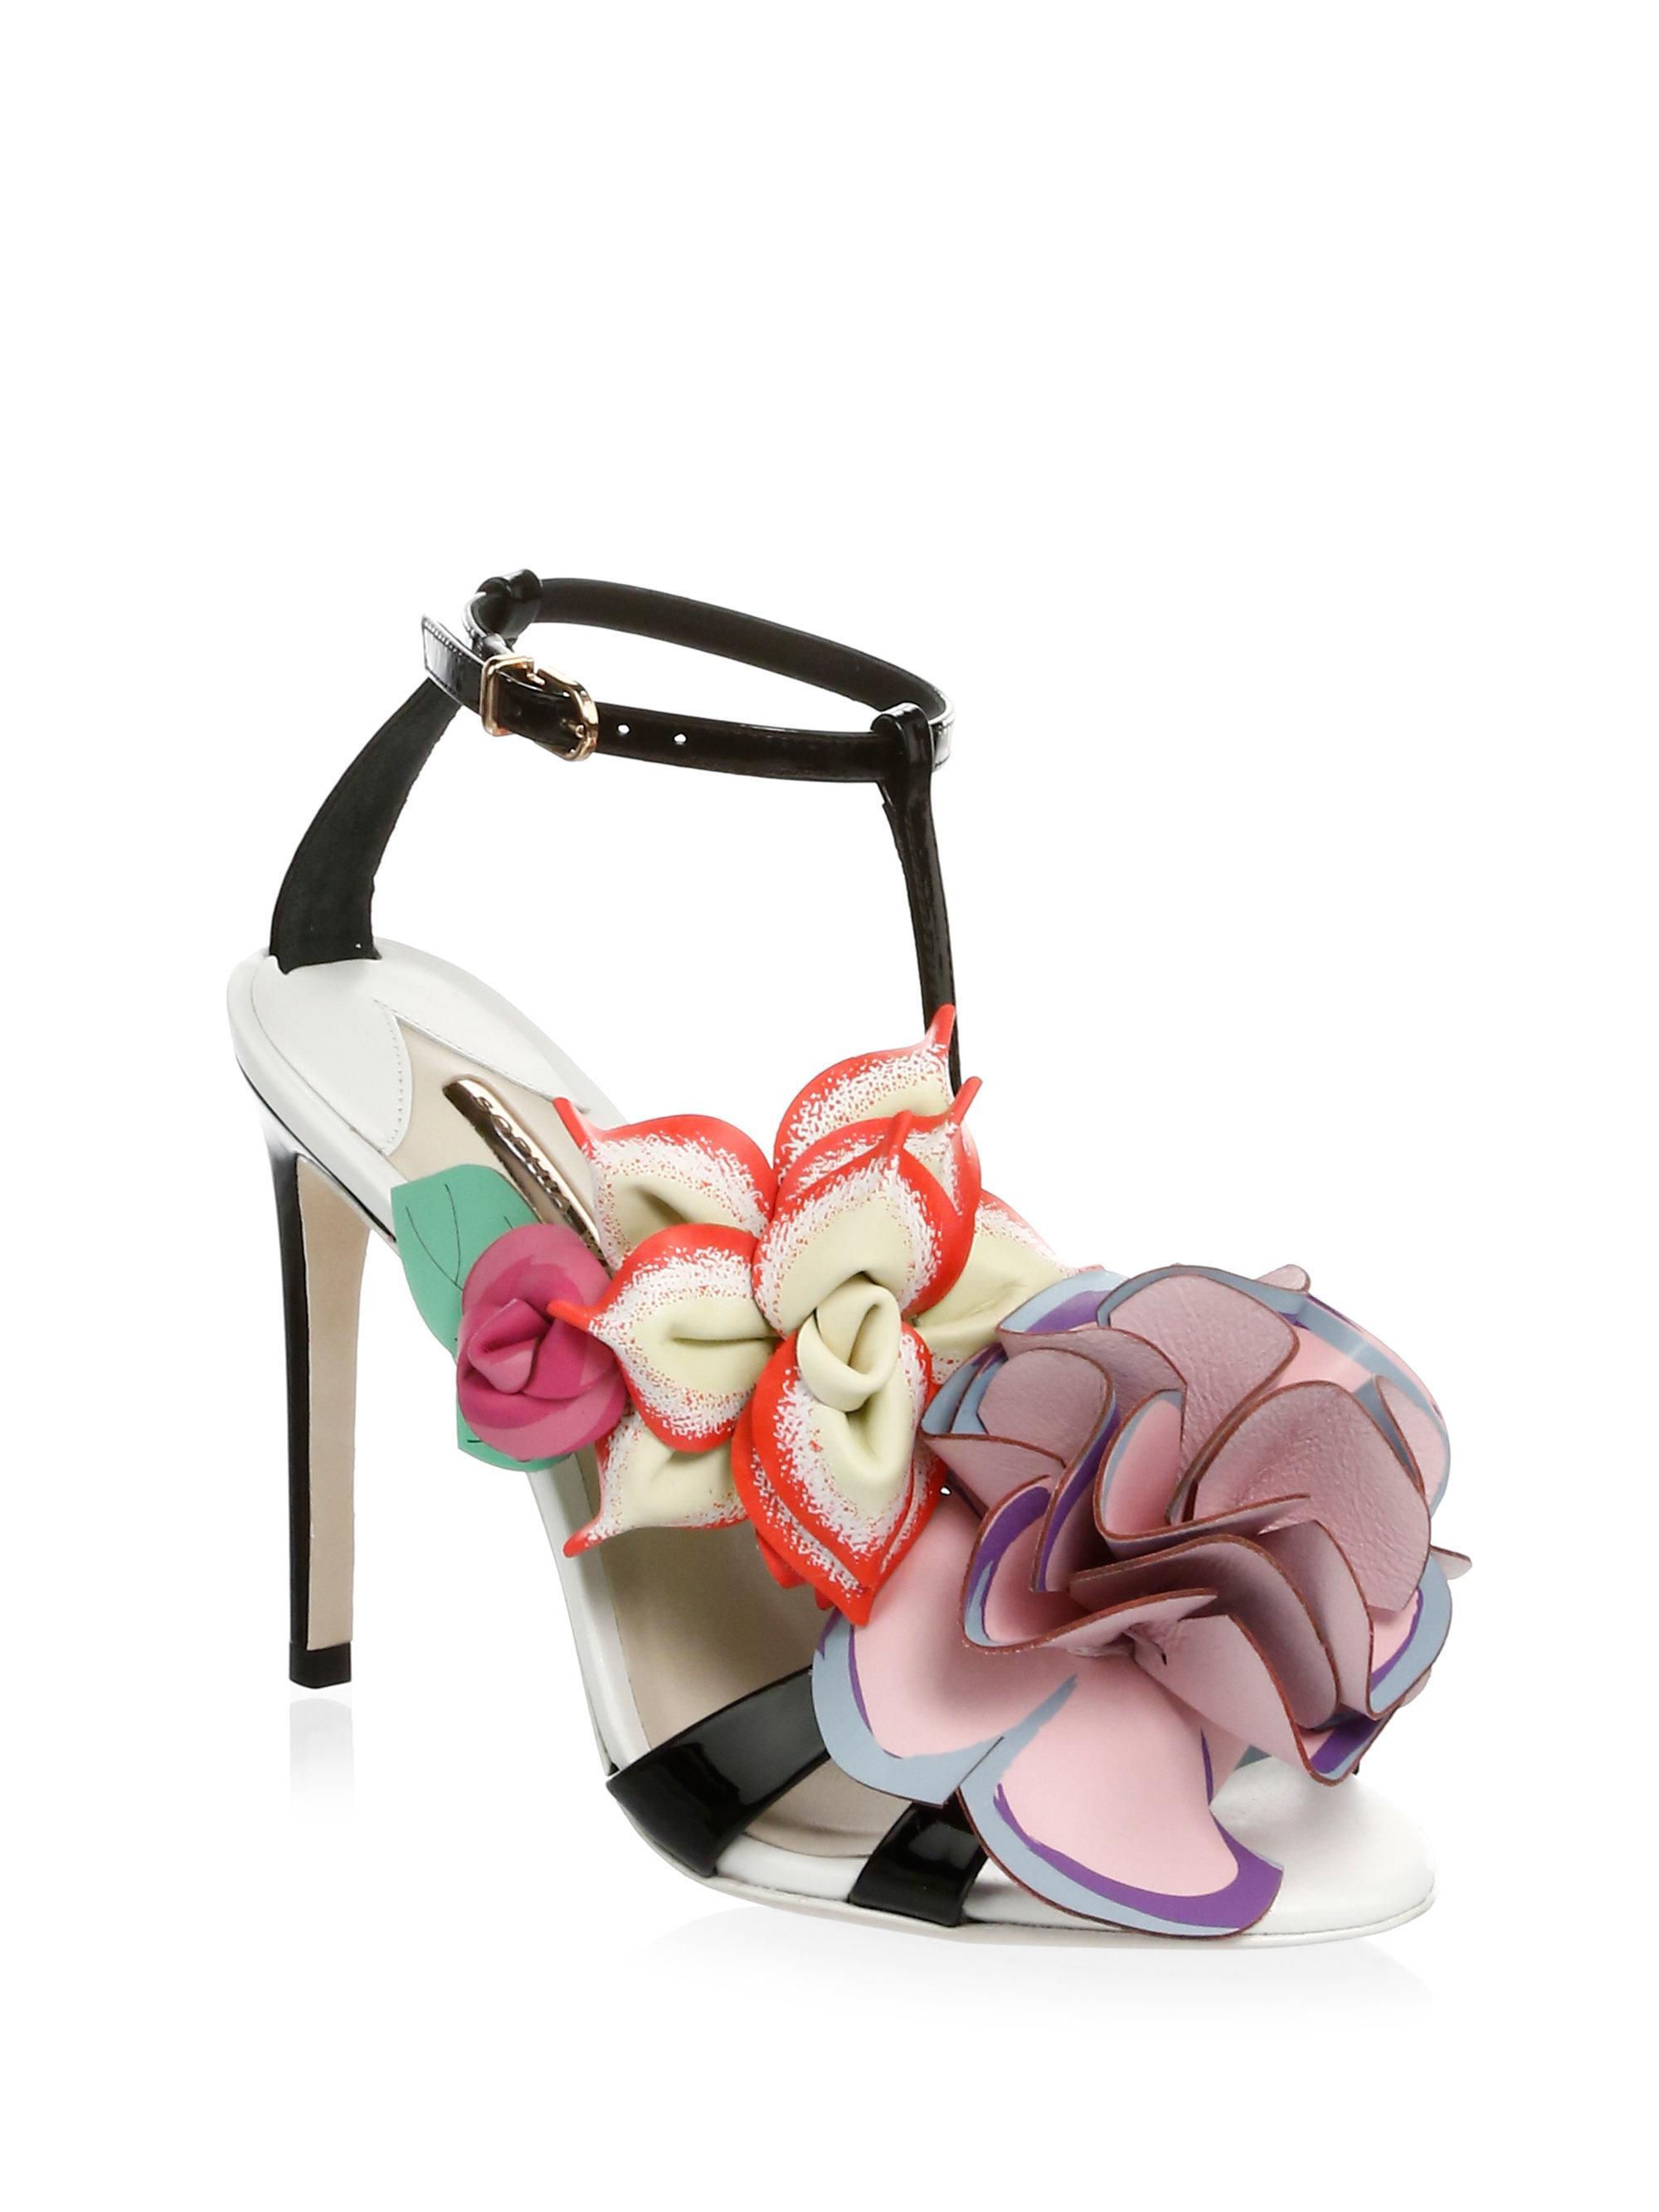 1a40e606e59 Sophia Webster Jumbo Lilico Patent Sandals in Black - Lyst